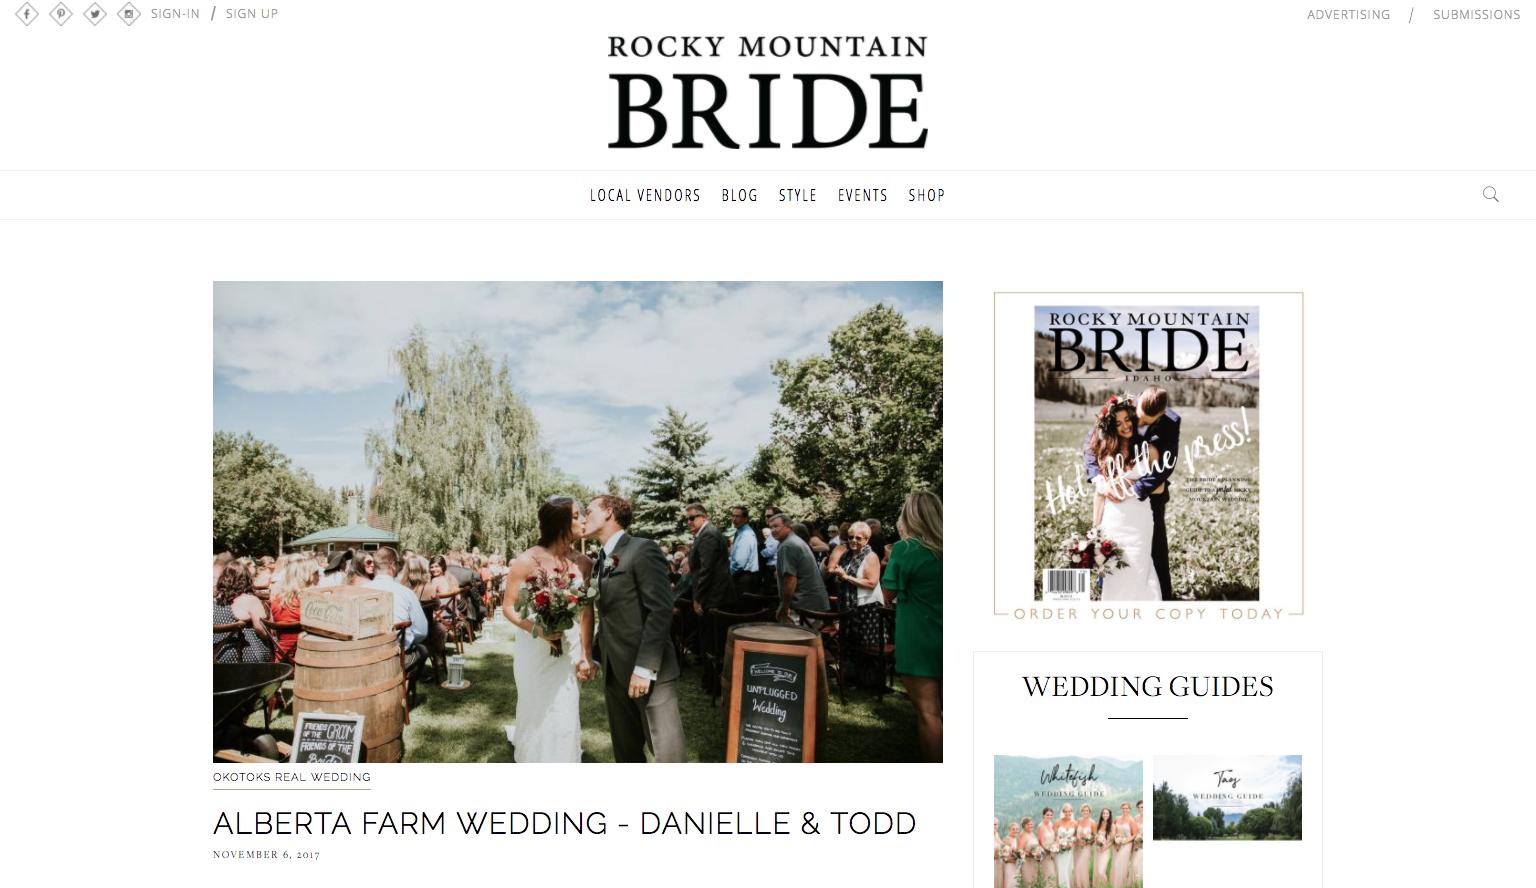 Featured on Rocky Mountain Bride - Alberta Farm Wedding